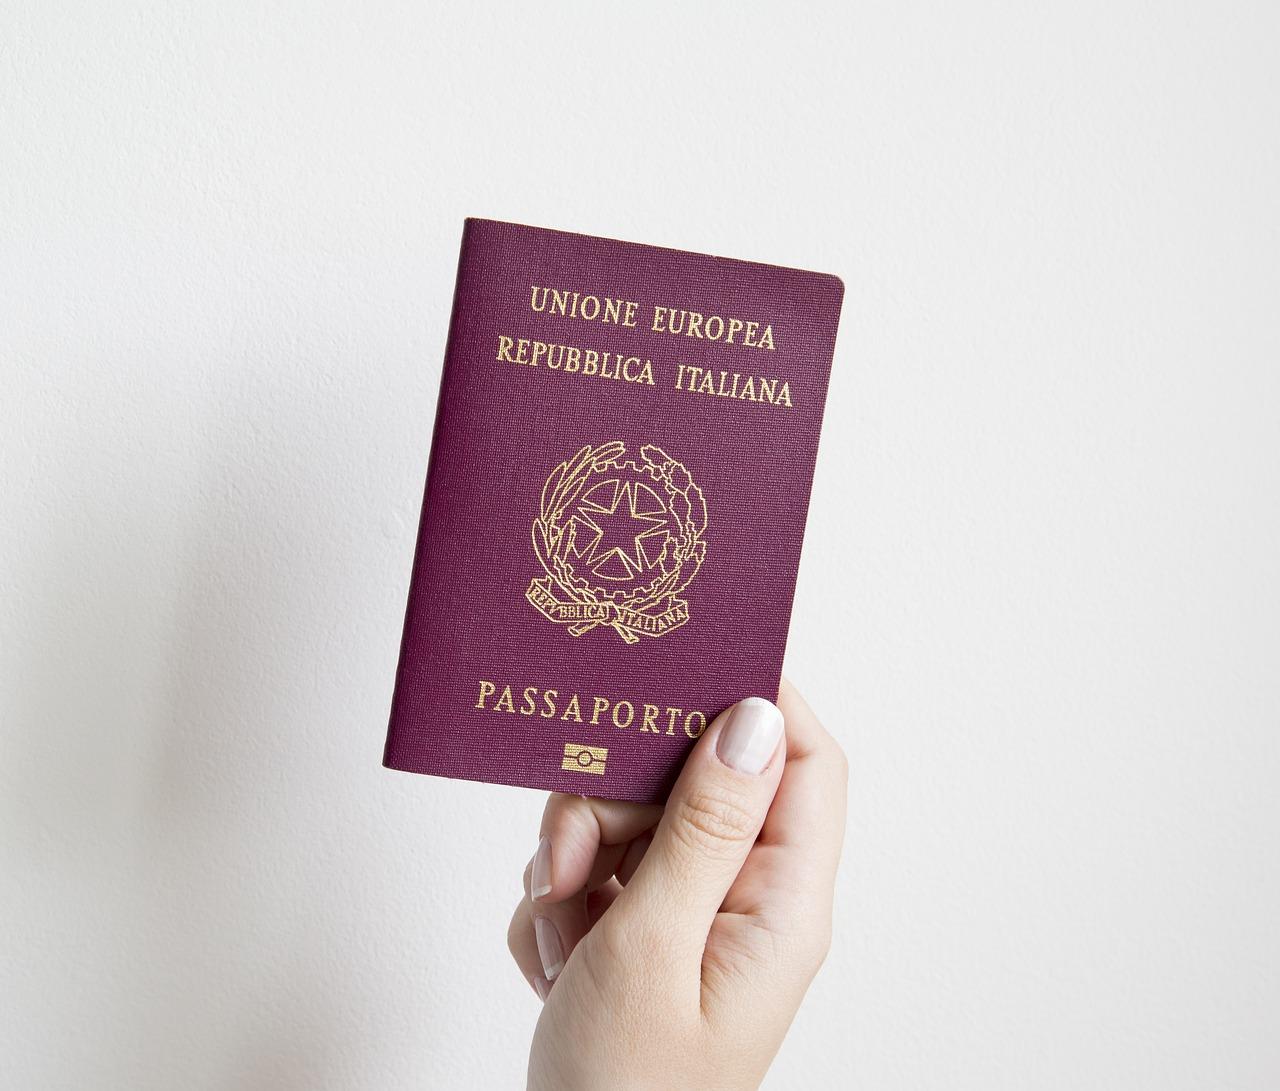 O-1 Visa Stati Uniti